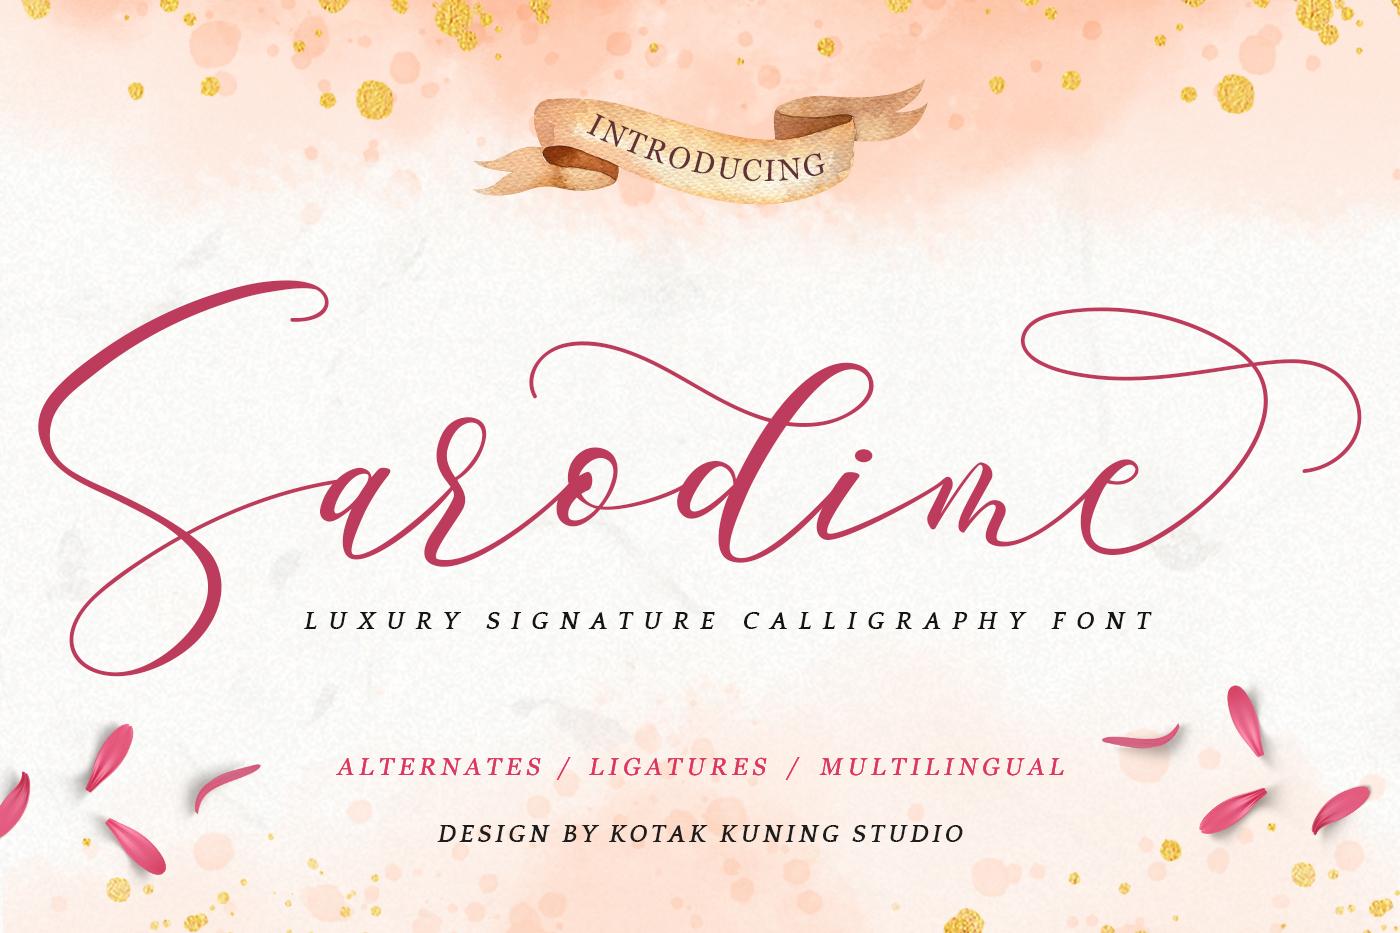 Sarodime - Romantic Calligraphy Font example image 1